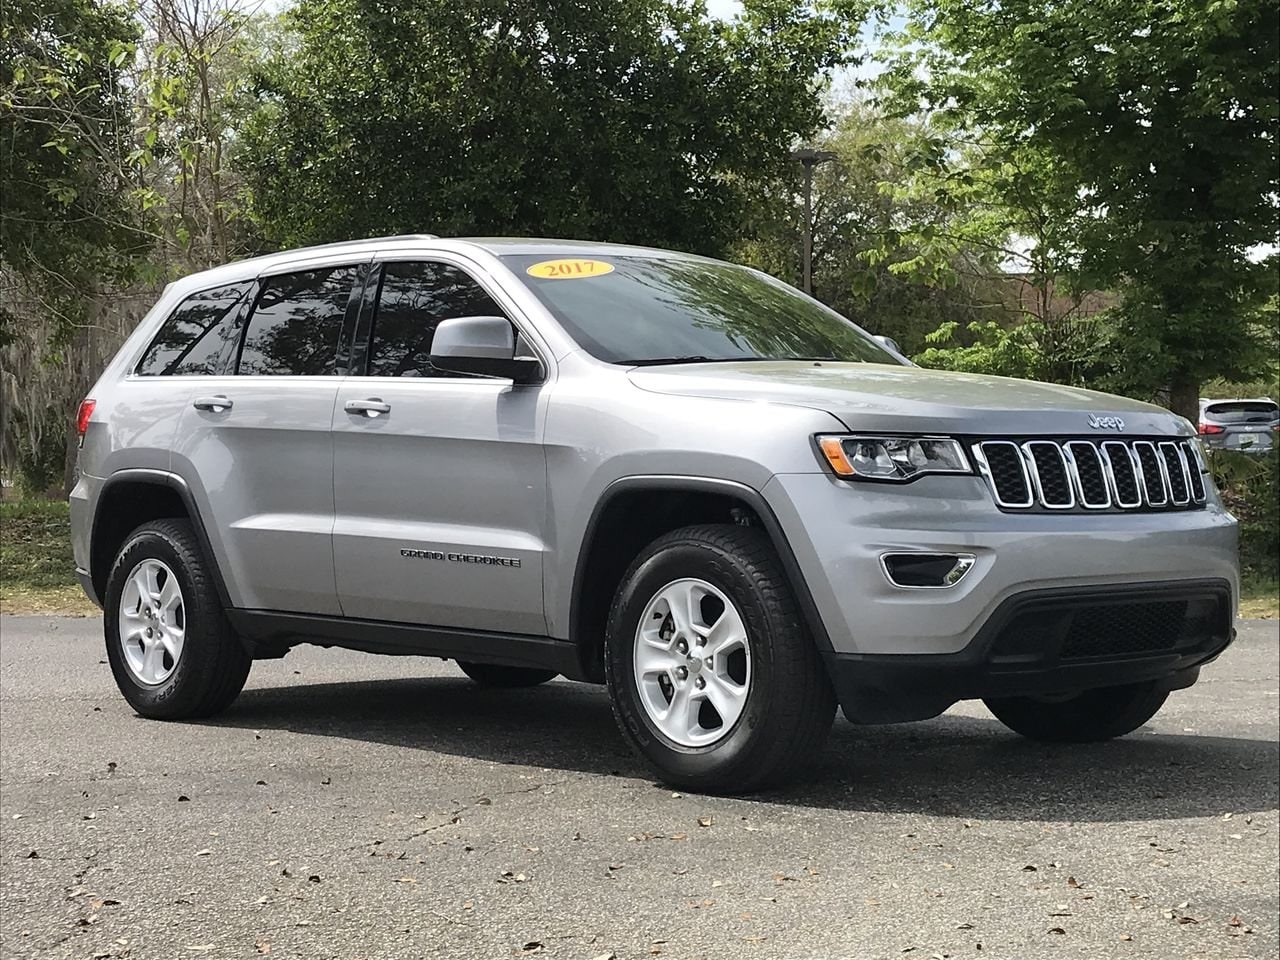 2017 Used Jeep Grand Cherokee Laredo 4x4 SUV For Sale   Ocala near  Gainesville   A4554